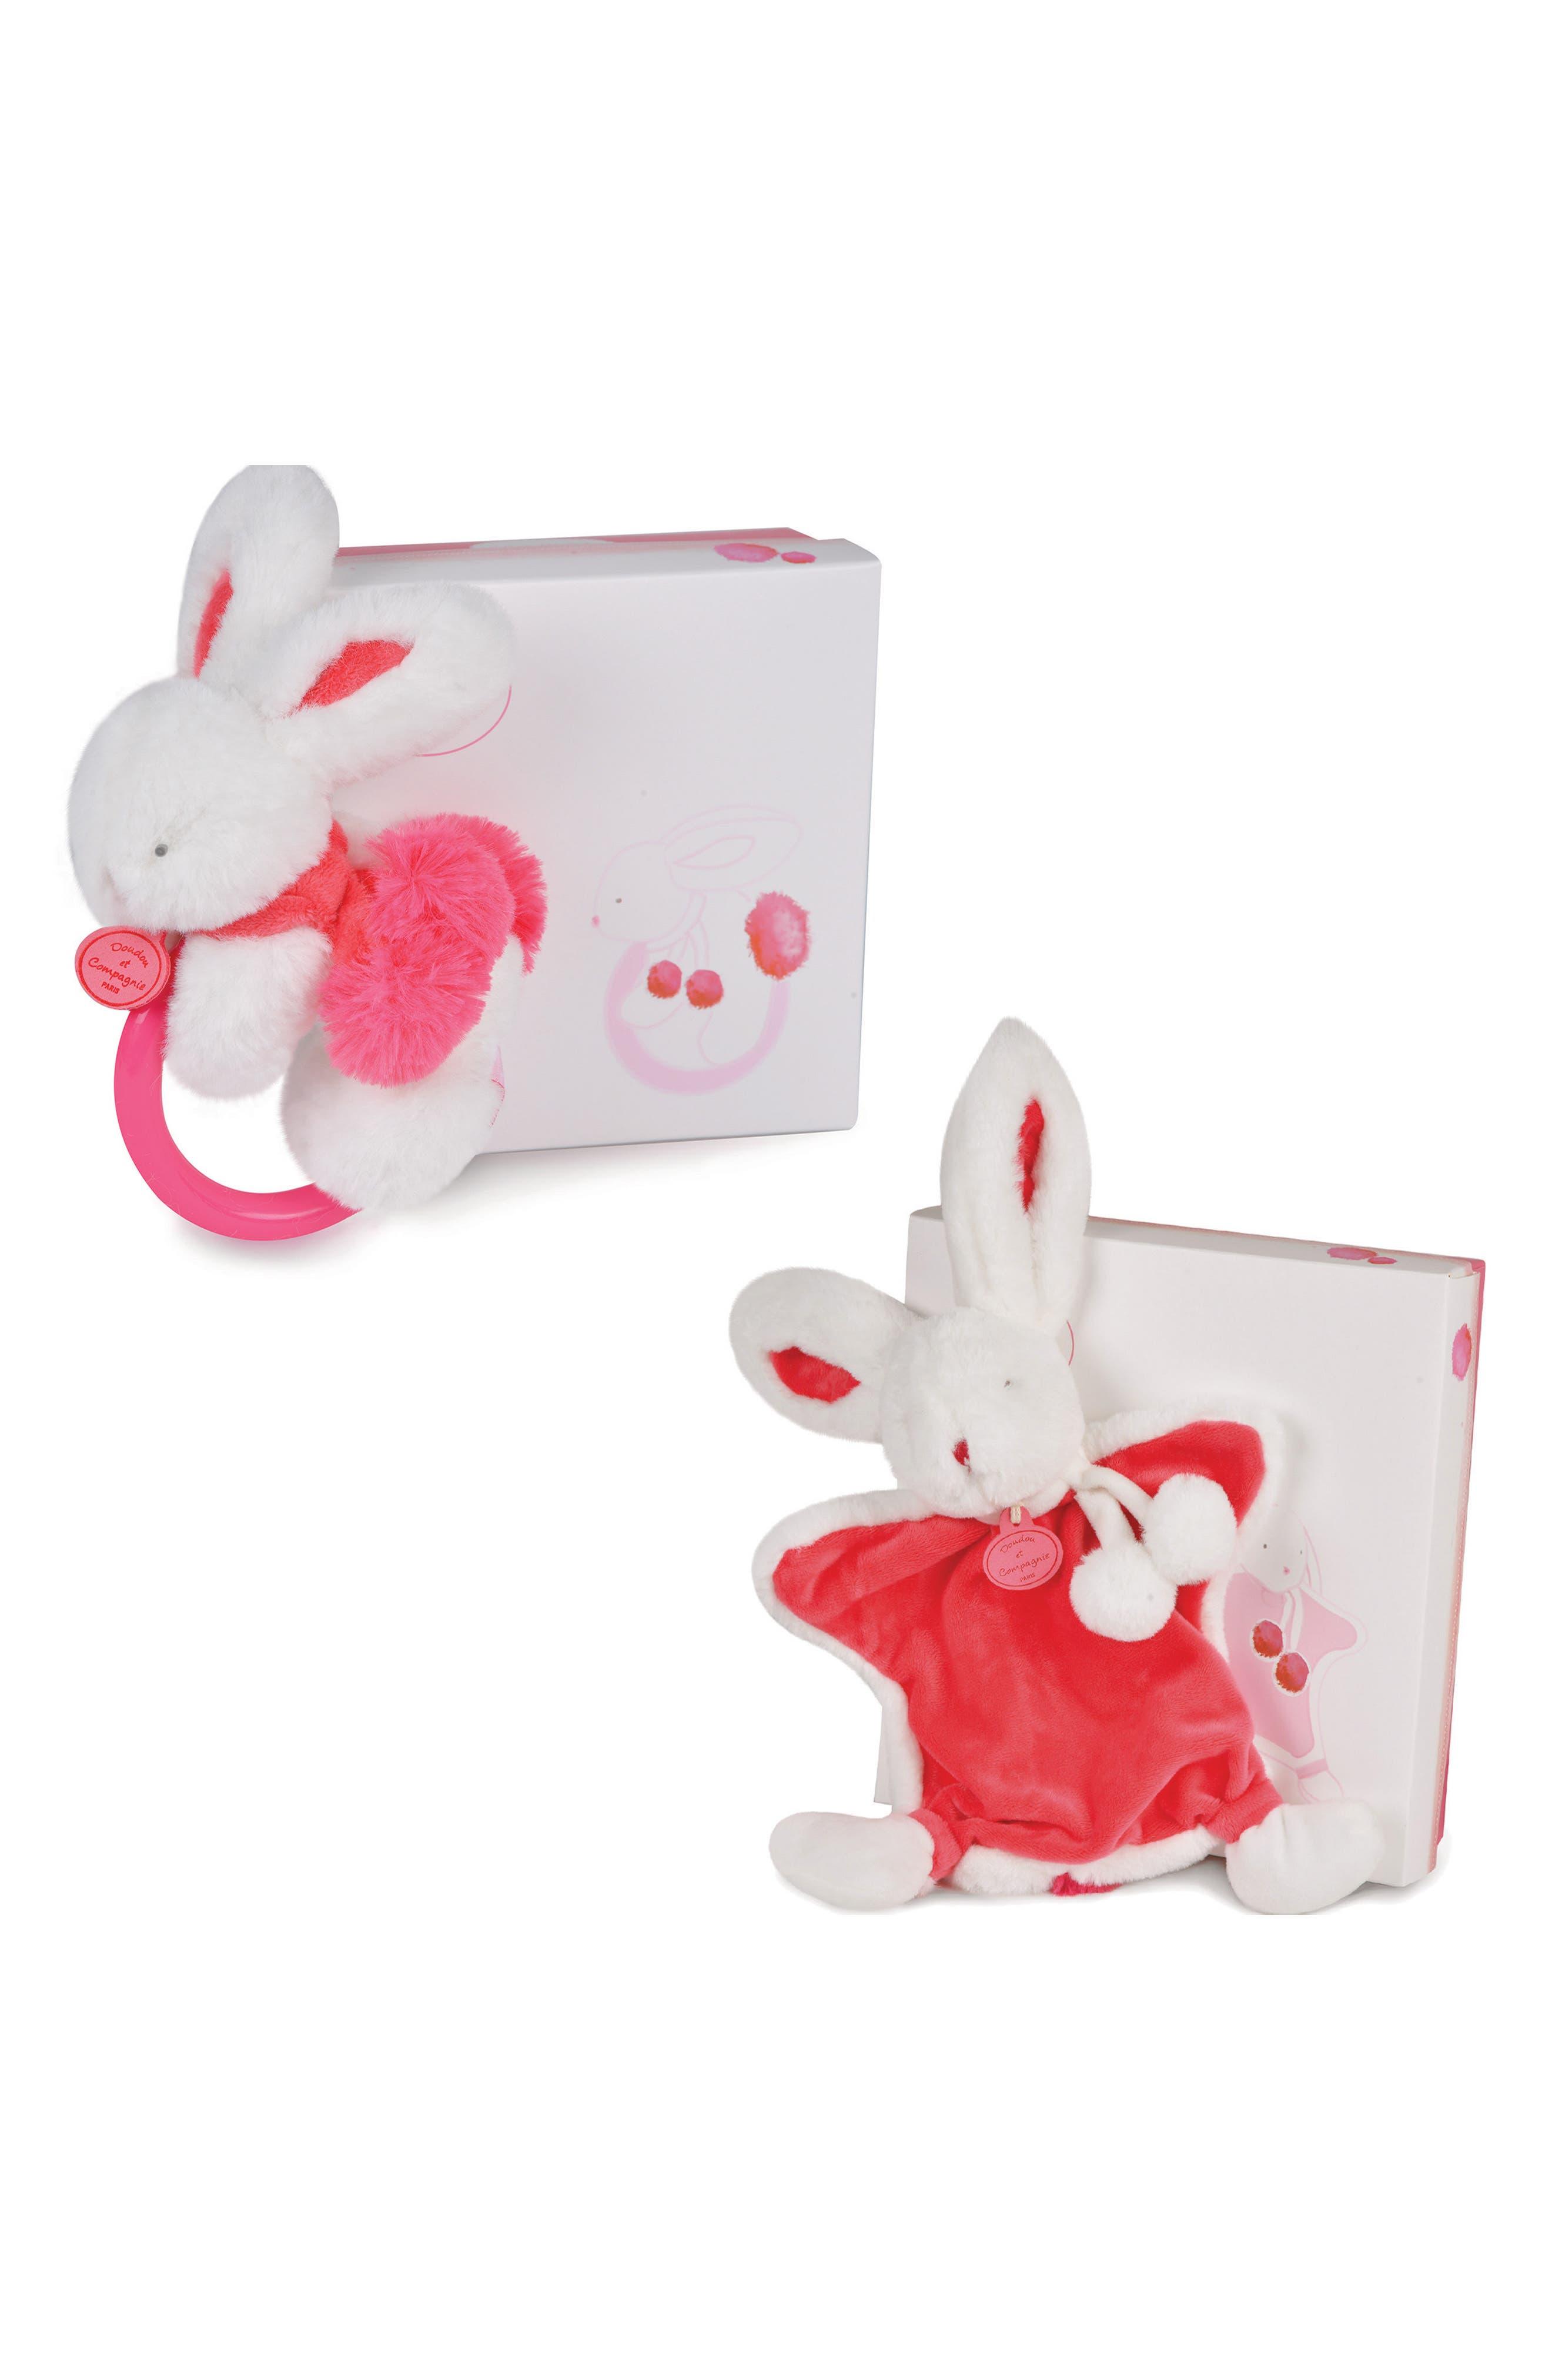 Strawberry Pink Bunny Rattle & Lovie Blanket Gift Set,                         Main,                         color, 650